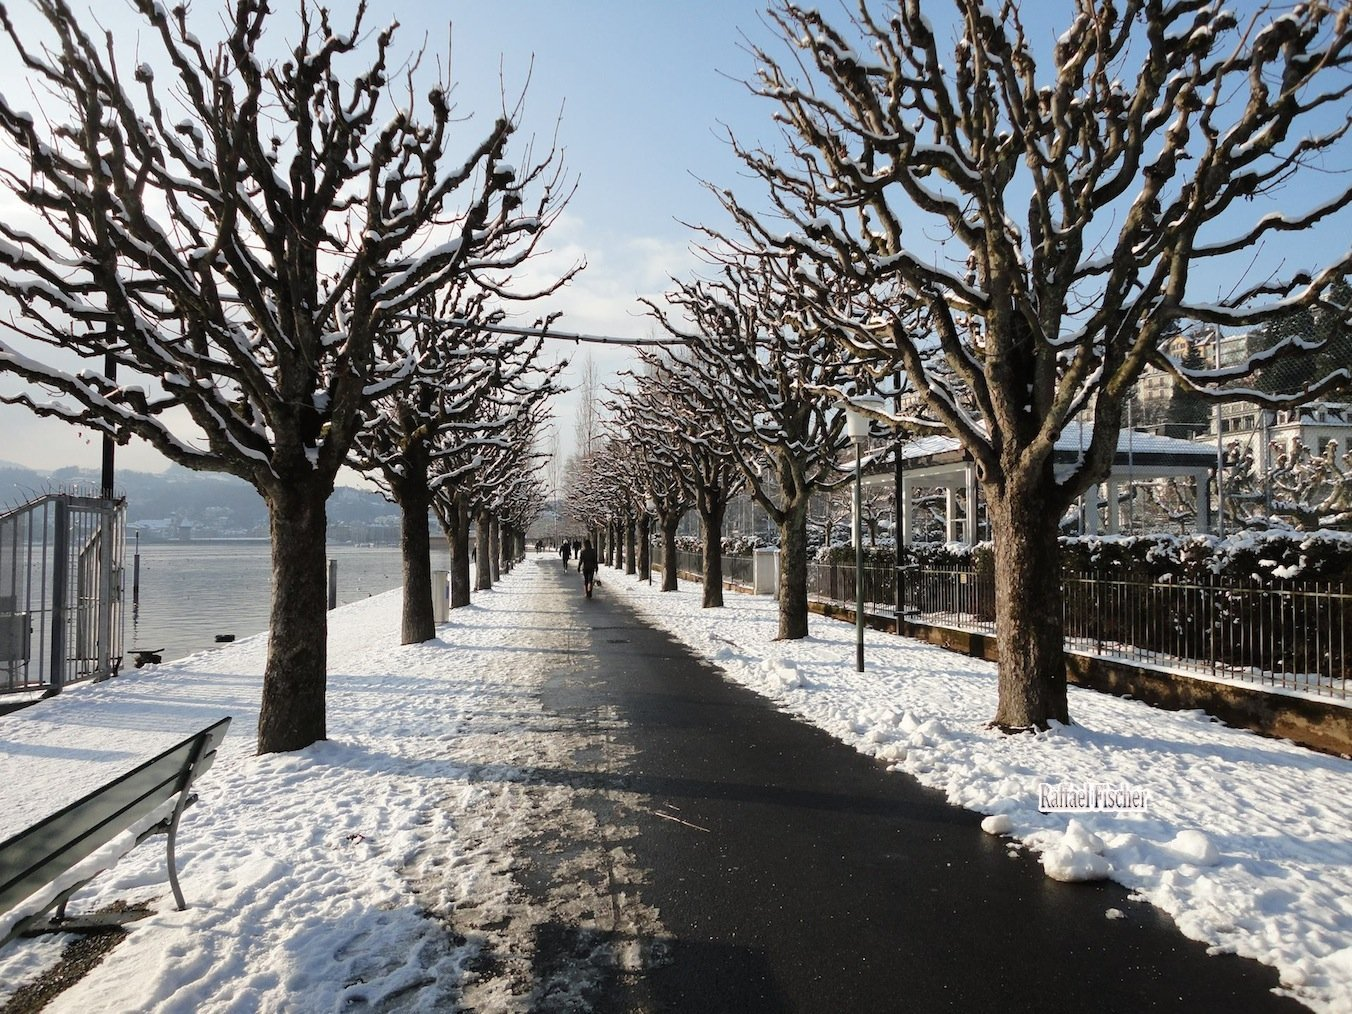 Winter in Luzern